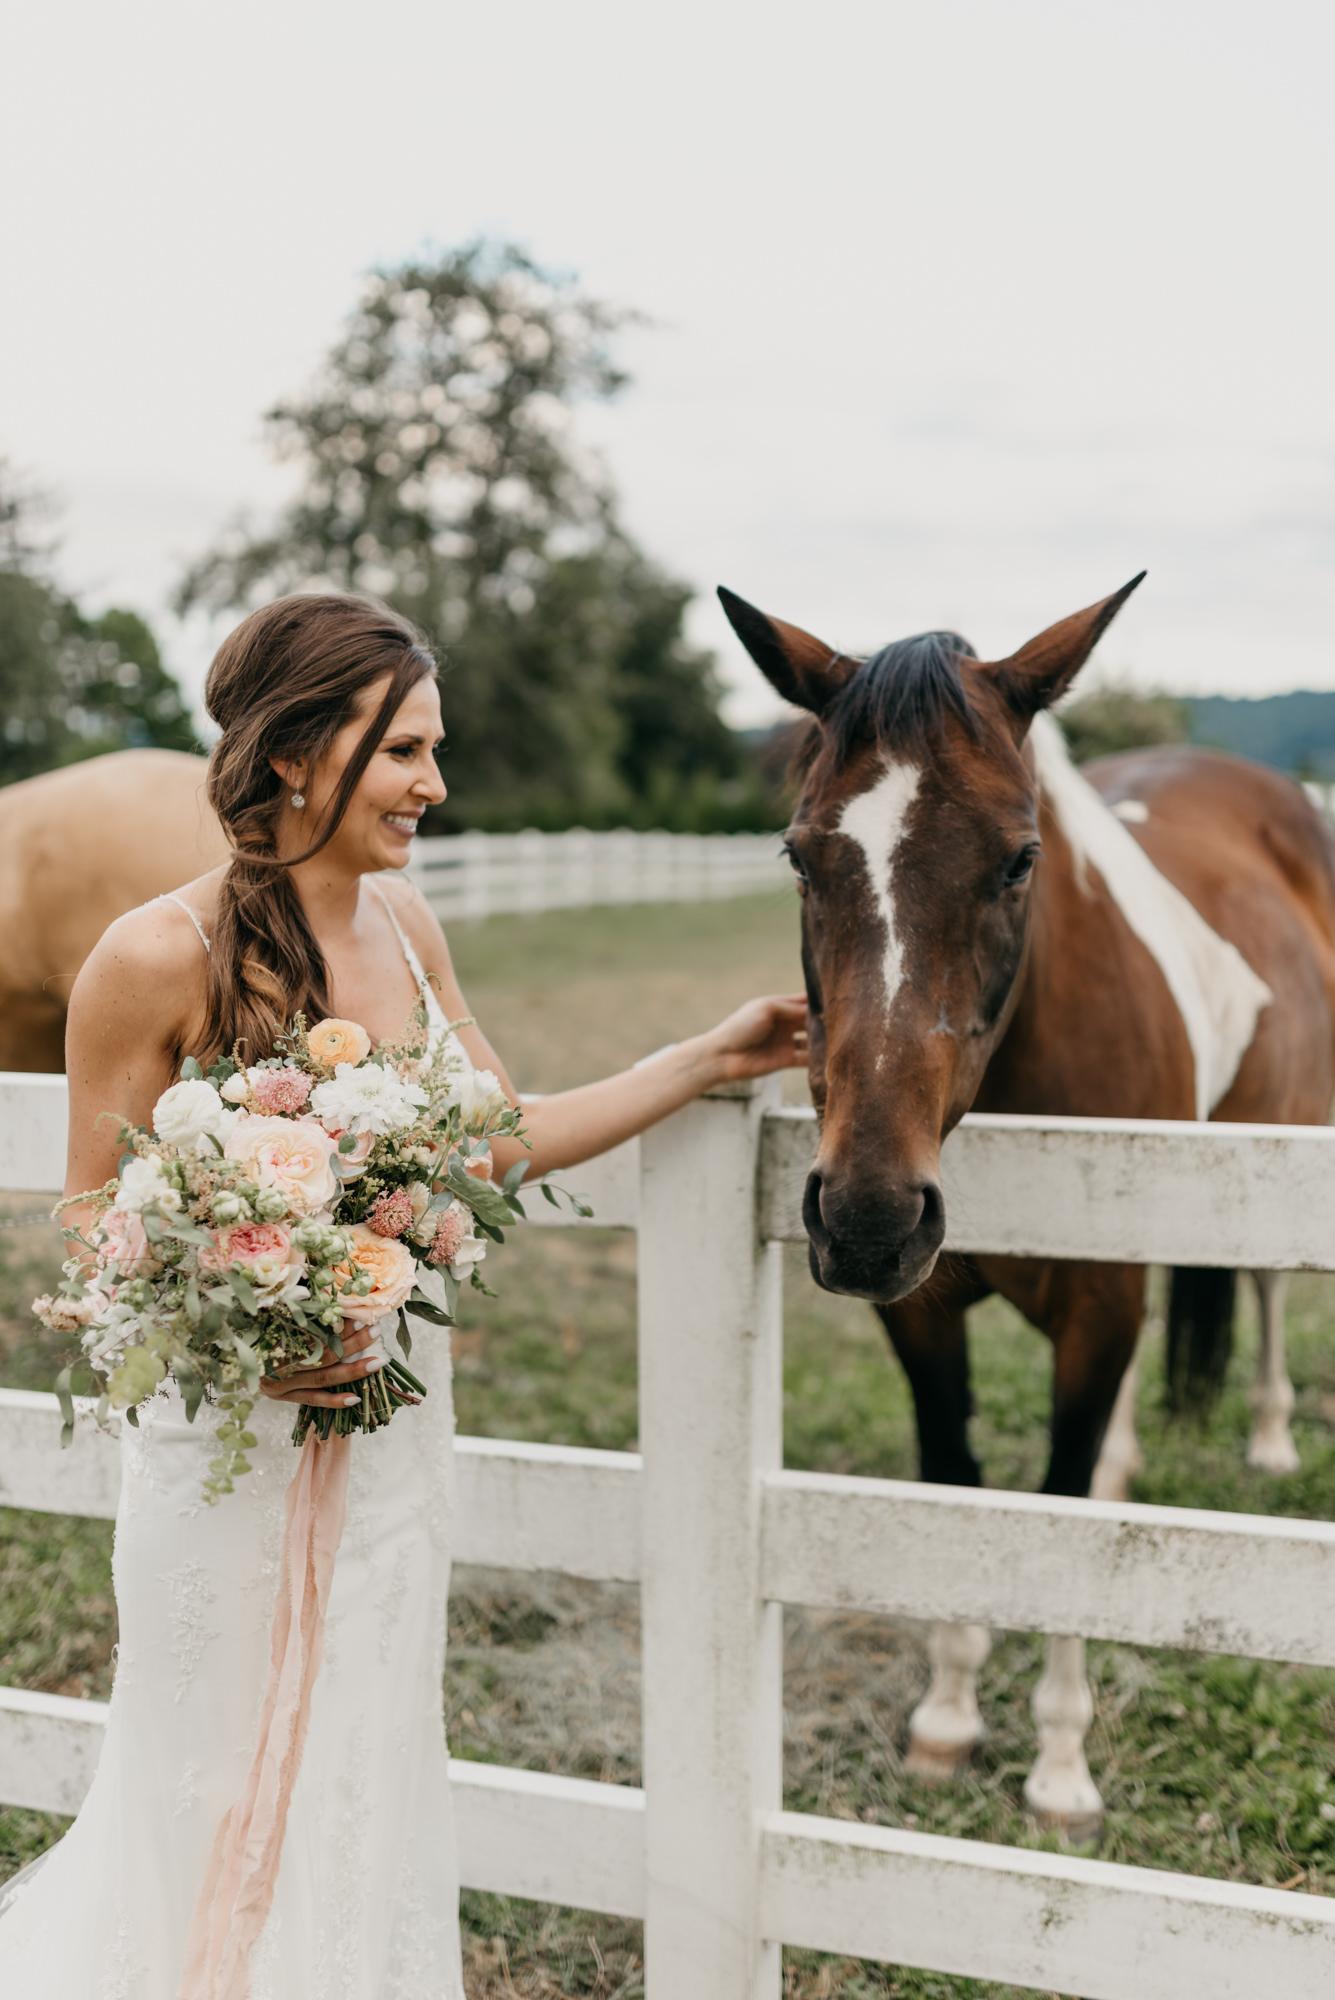 186-barn-kestrel-portland-northwest-horse-sunset-wedding.jpg